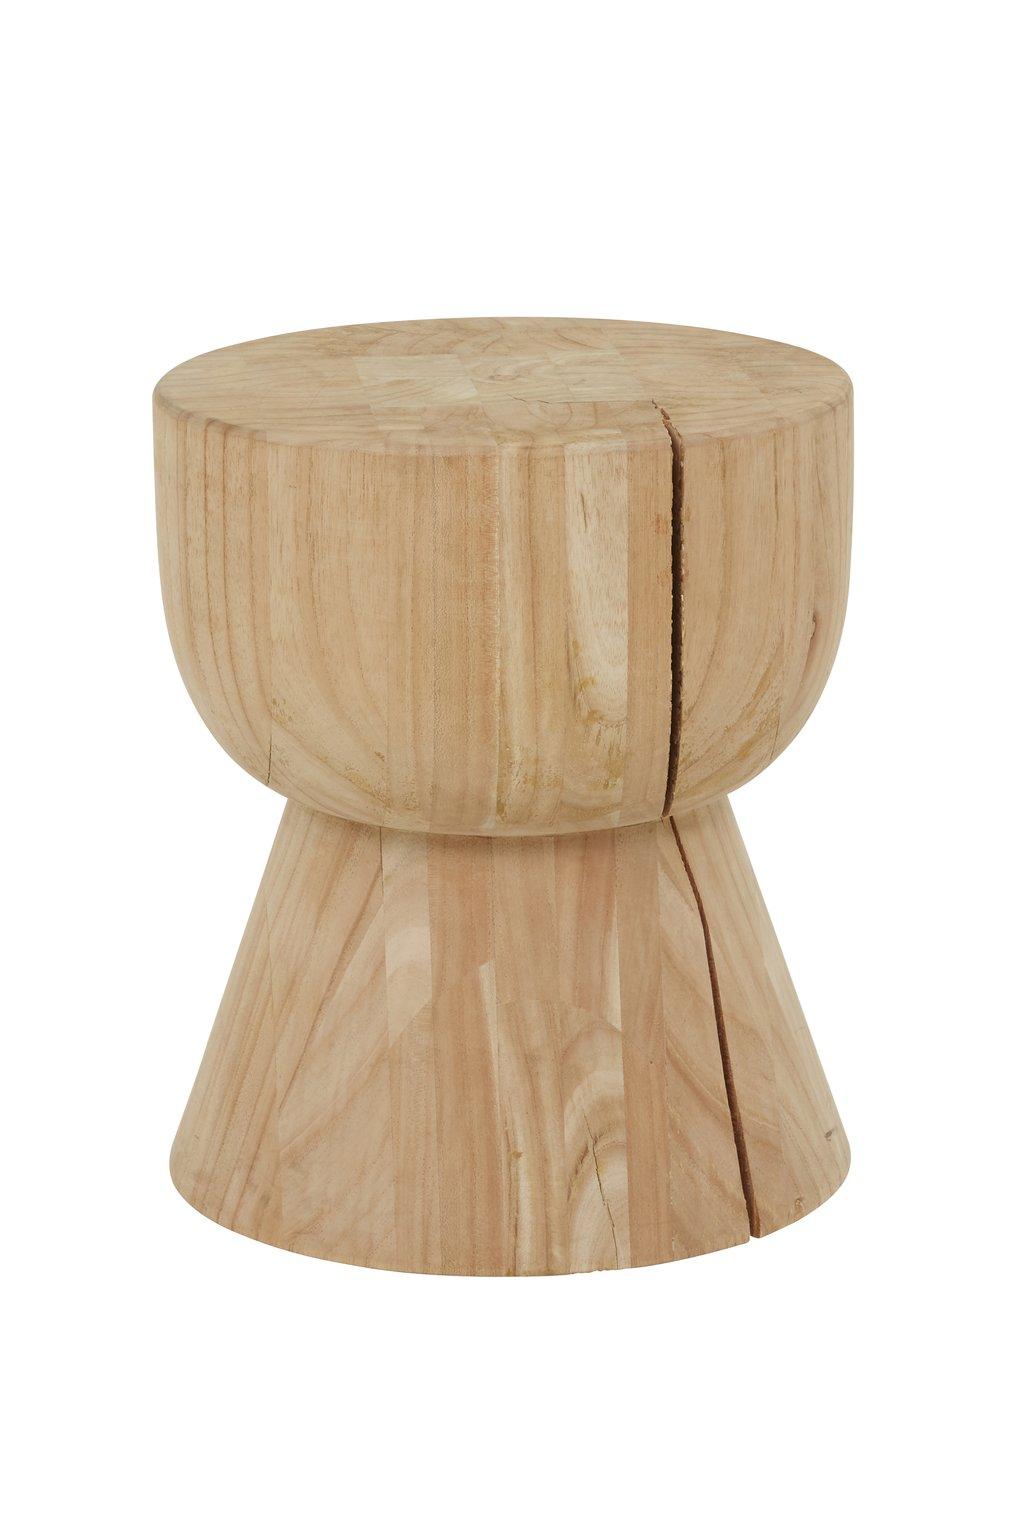 Woodrow Hourglass stump/stool to fenton & fenton - Transform your home into a tropical paradise | Aliz's Wonderland